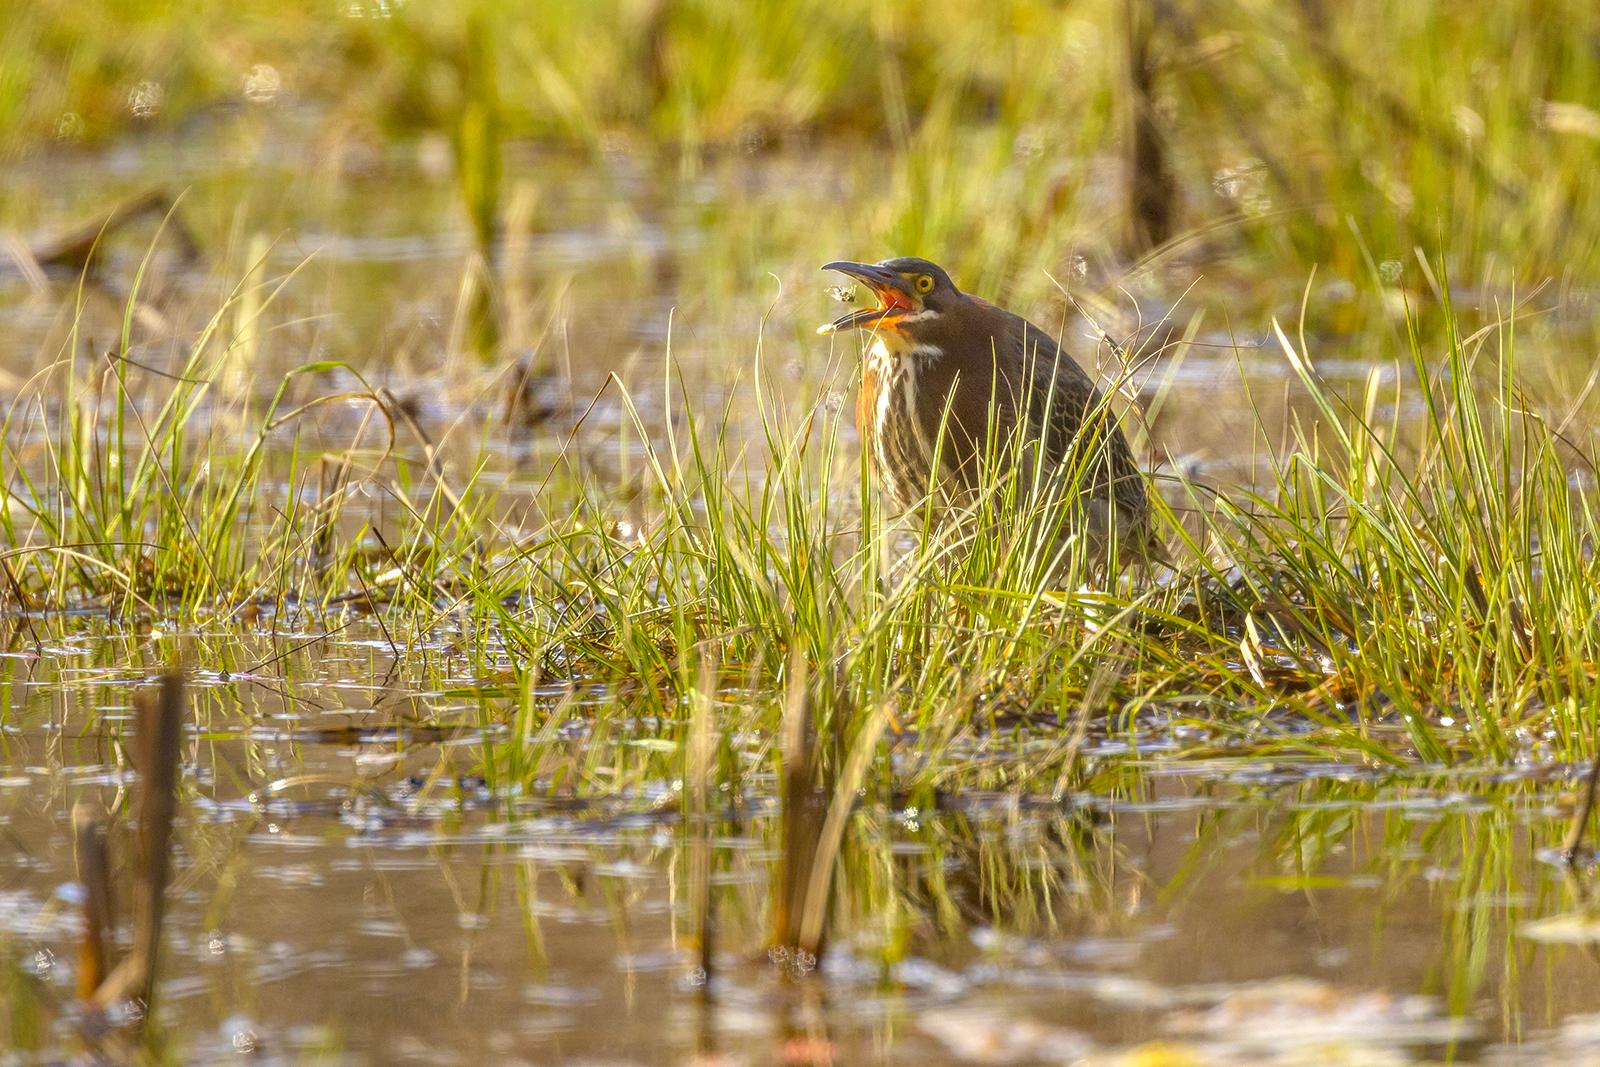 Green-Heron-Moncton-New-Brunswick-BRimages.ca